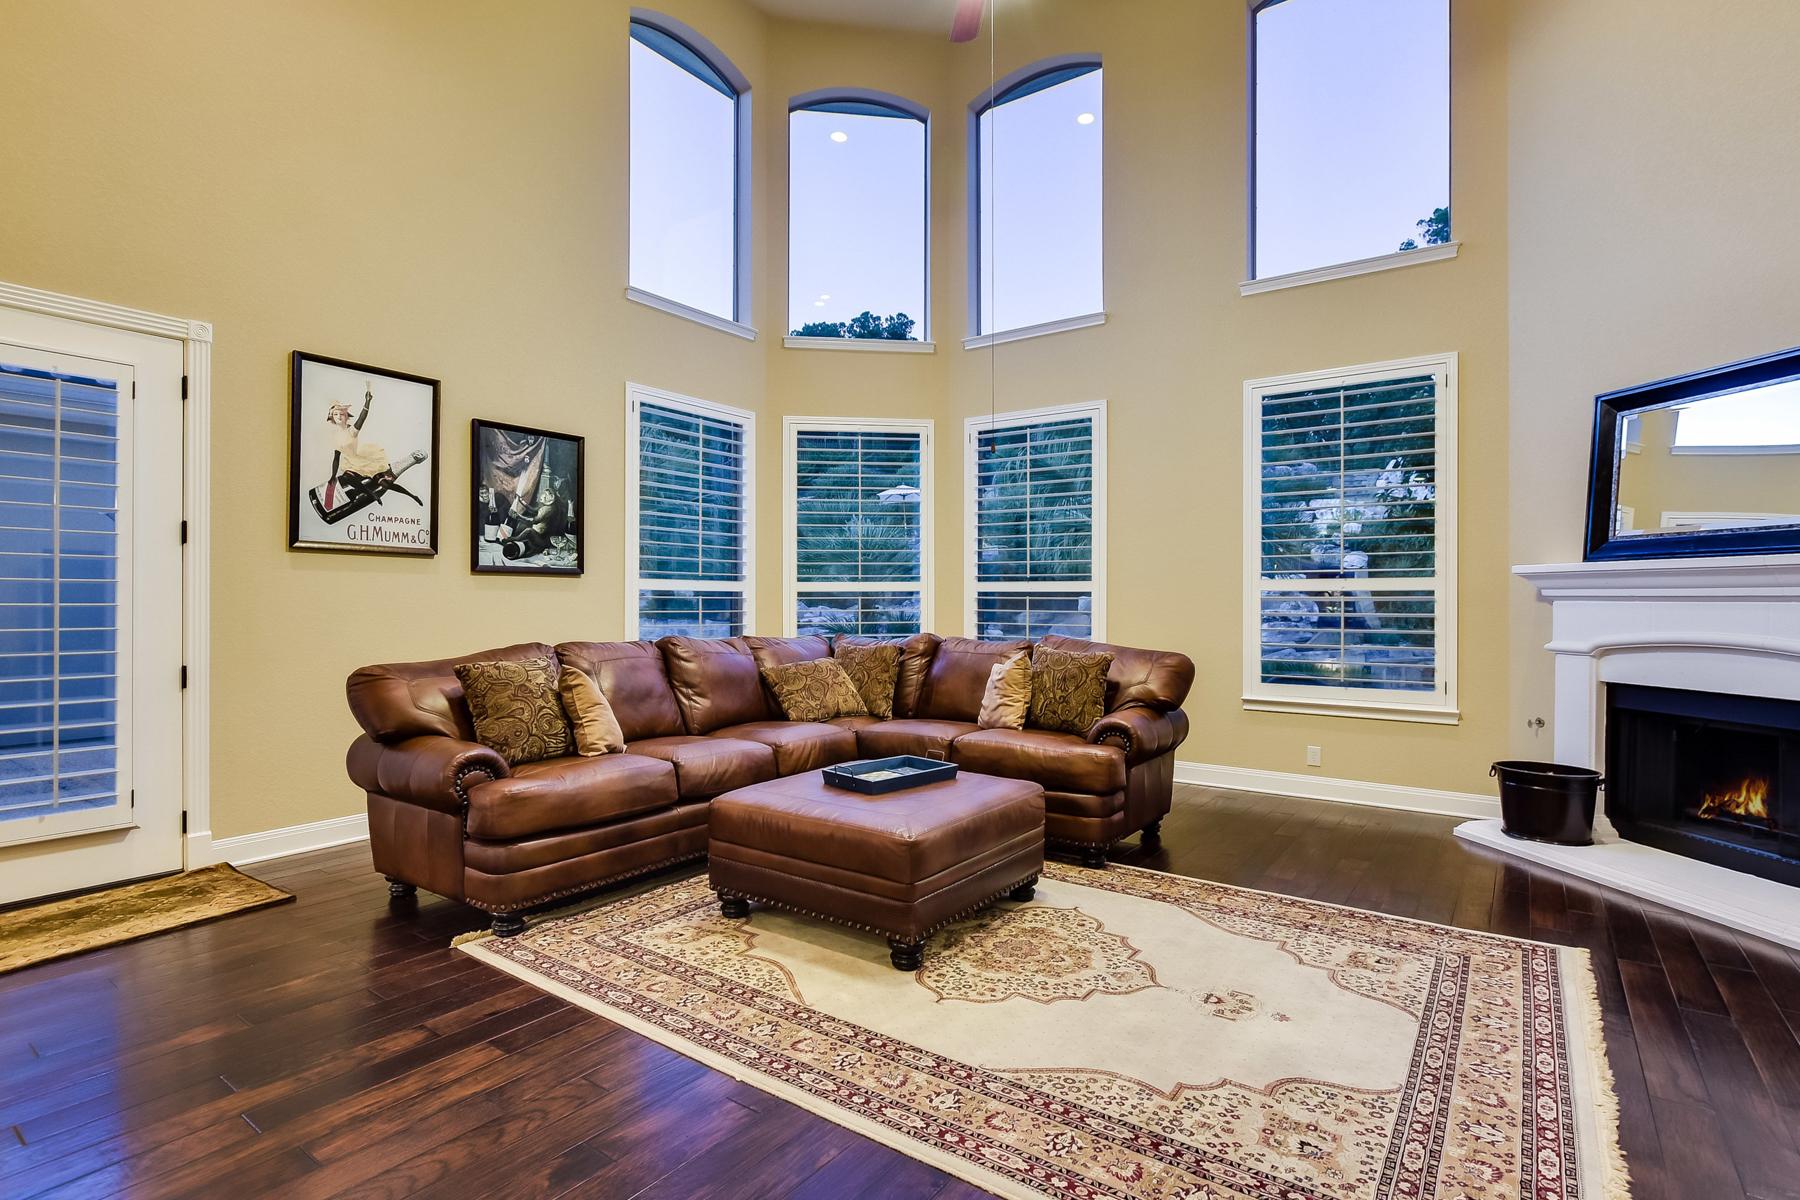 Additional photo for property listing at Pristine Mediterranean Estate in The Dominion 24827 Ellesmere San Antonio, Texas 78257 United States